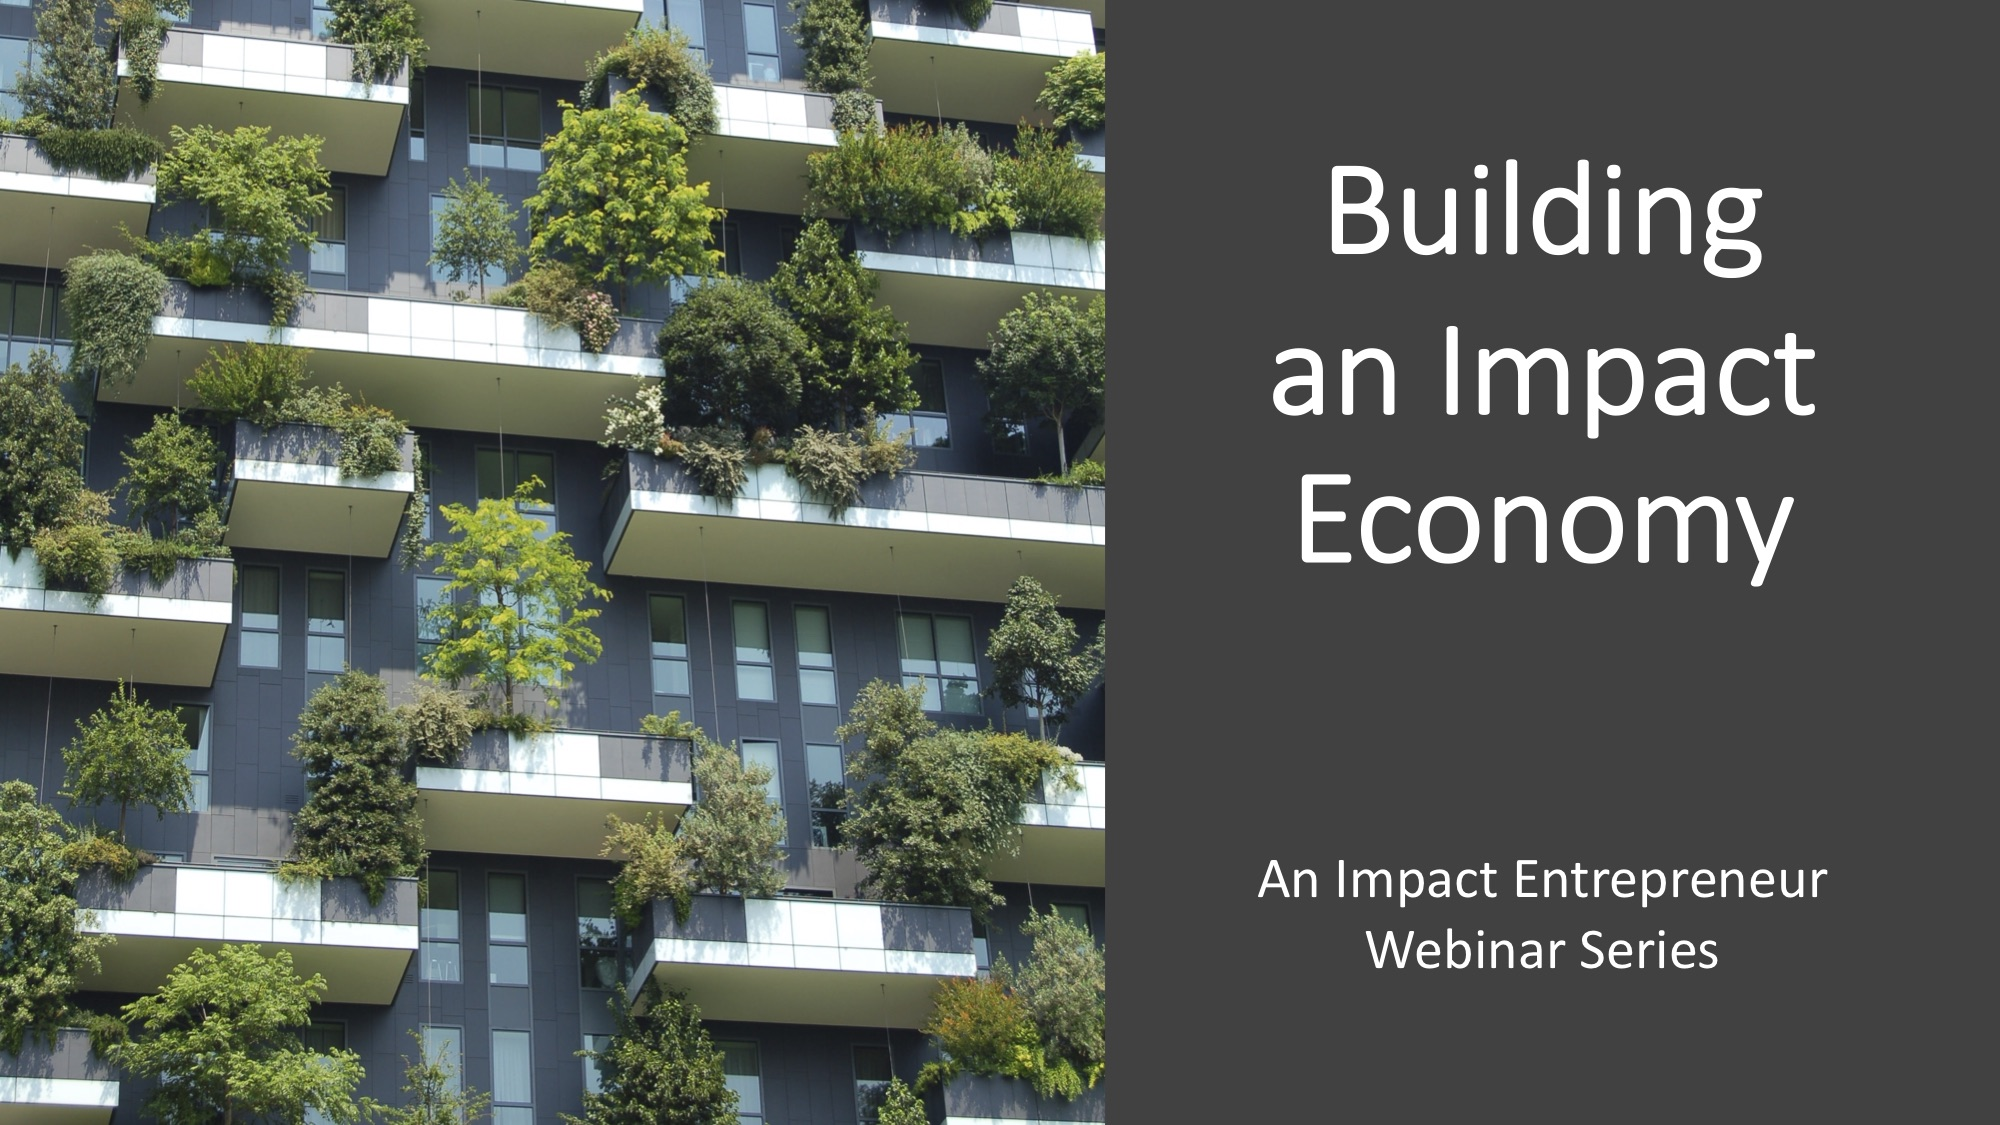 Building and Impact Economy Season Two Lead Image.jpg